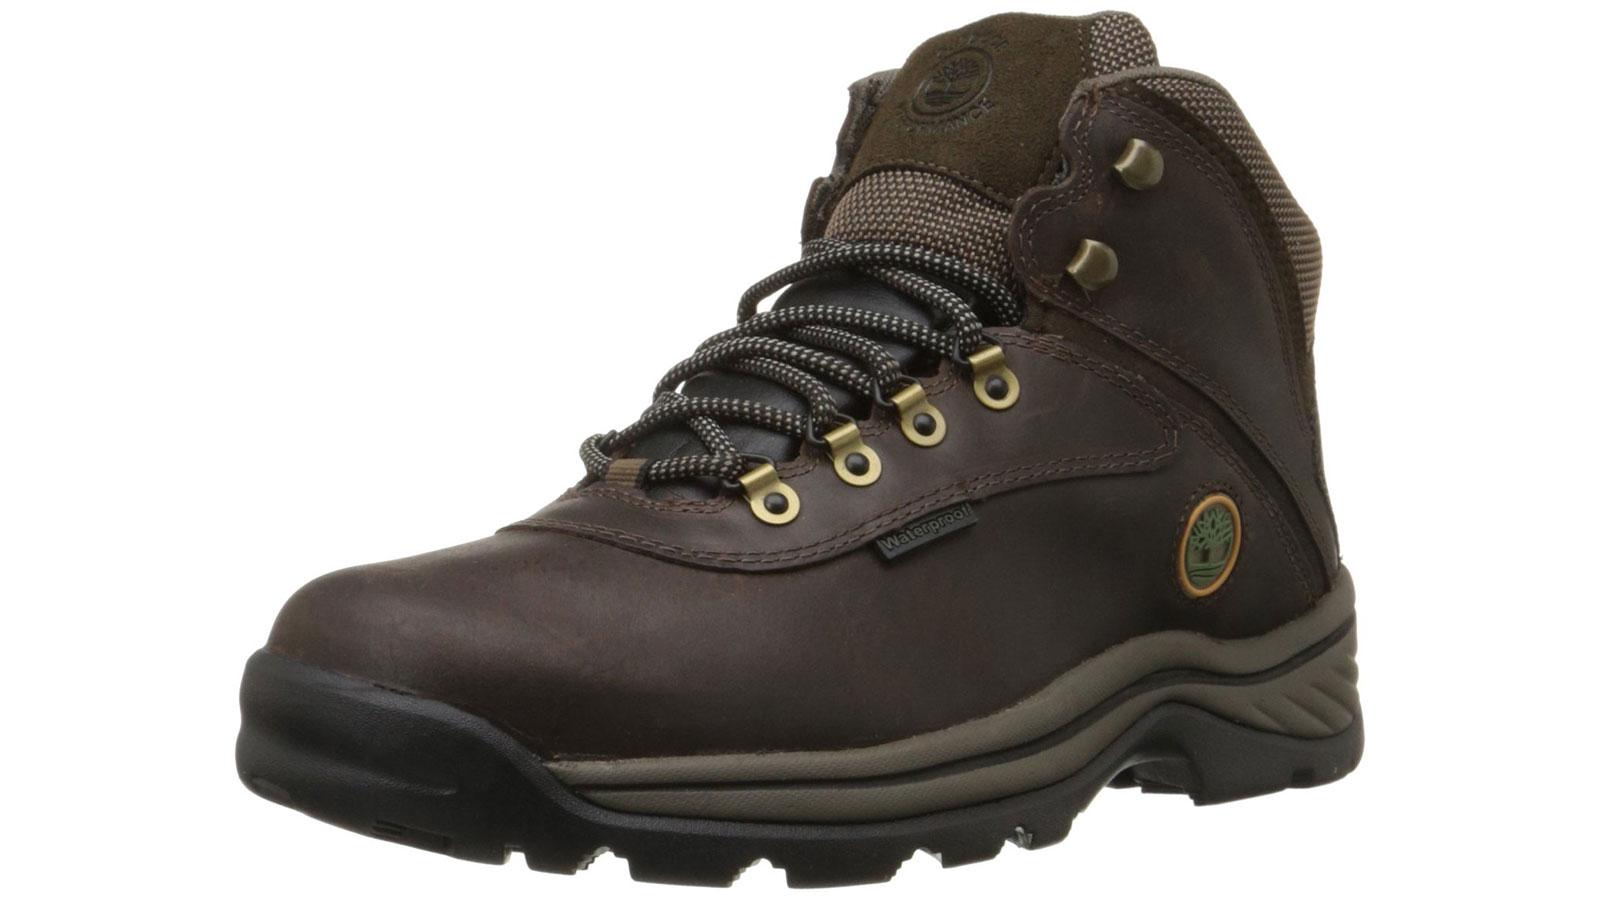 Timberland White Ledge Men's Waterproof Hiking Boot | the best men's waterproof boots